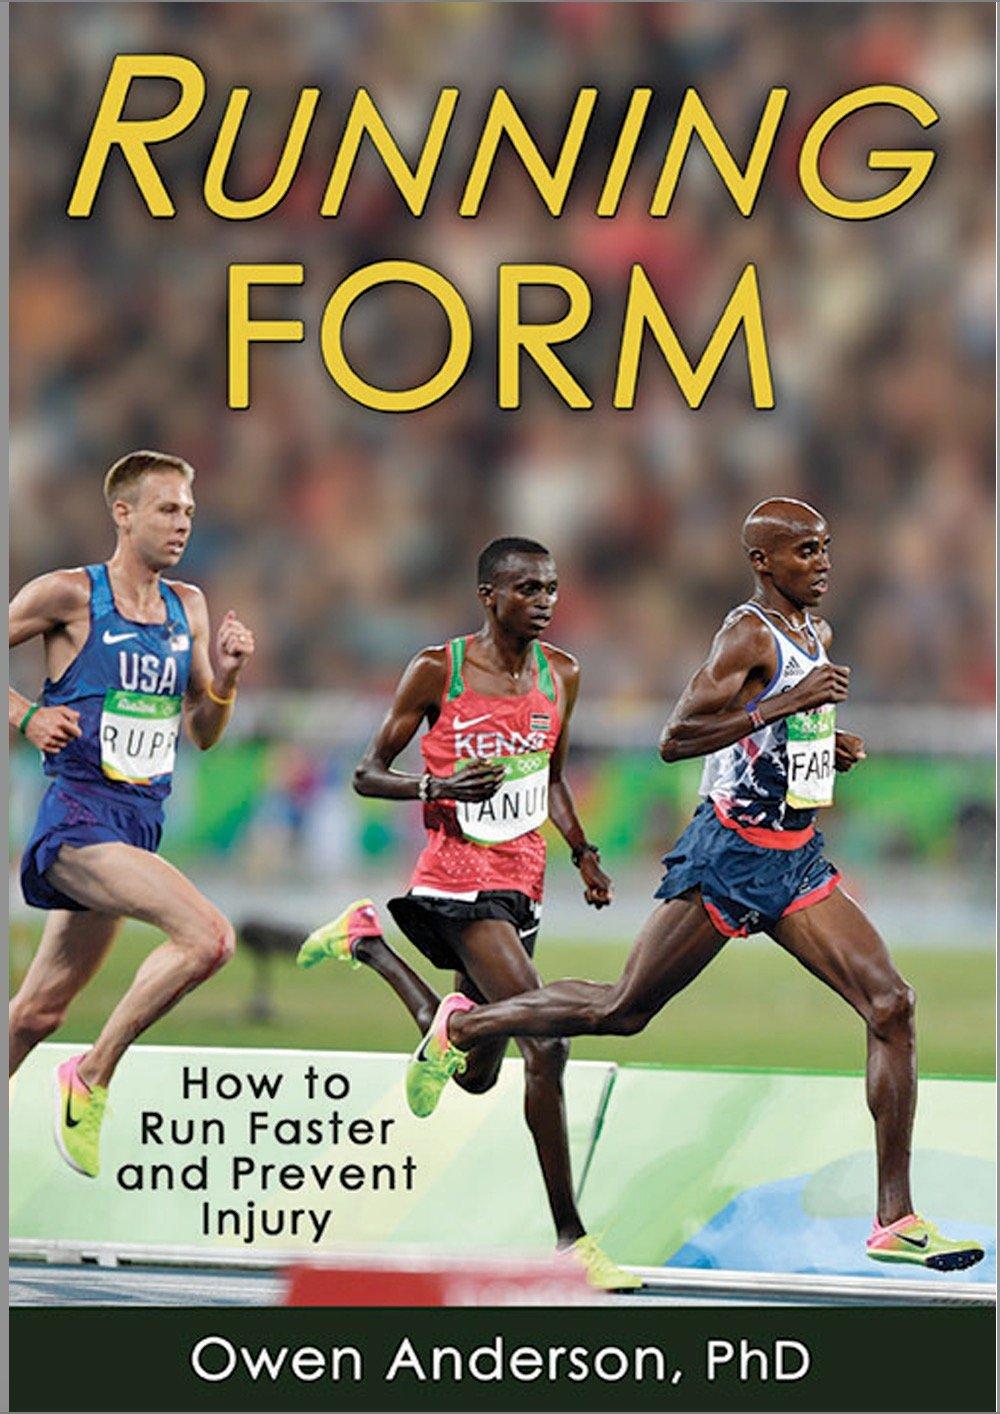 runing faster avoiding injury